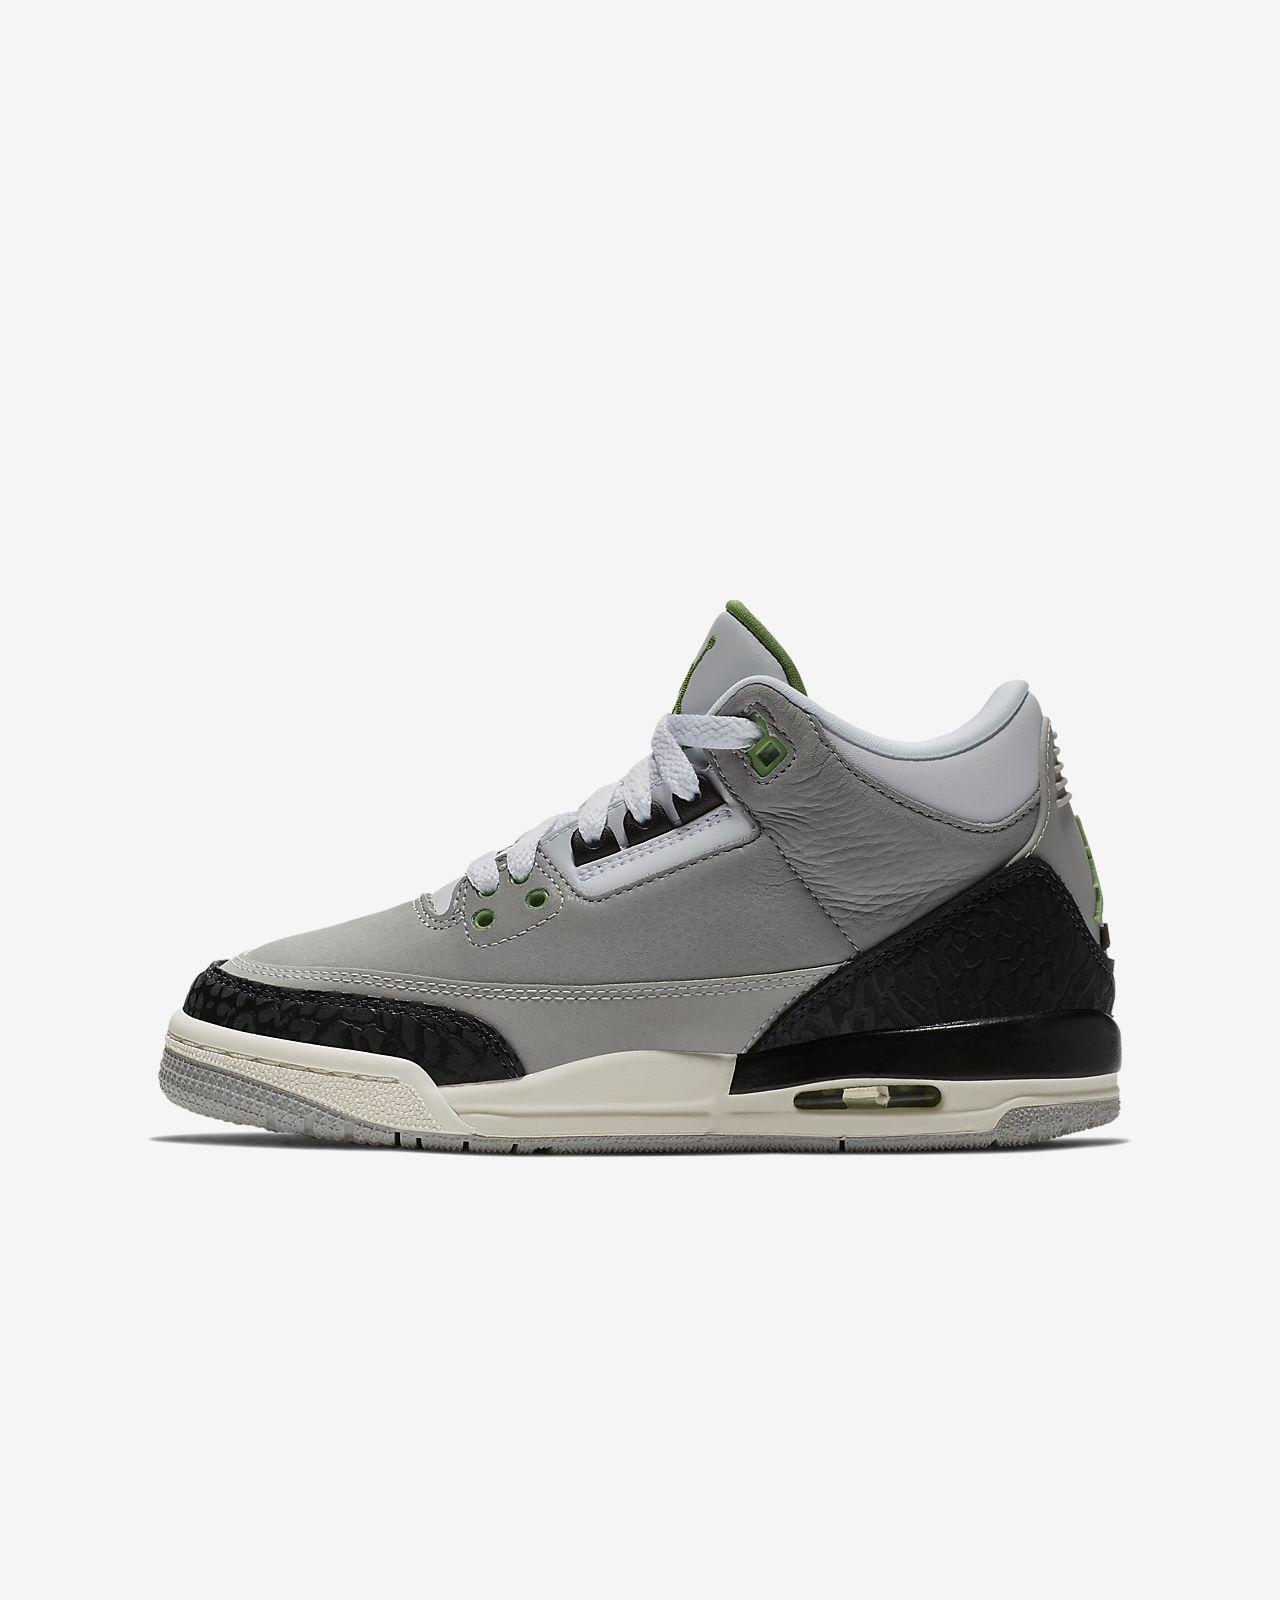 Air Jordan 3 Retro 兒童鞋款